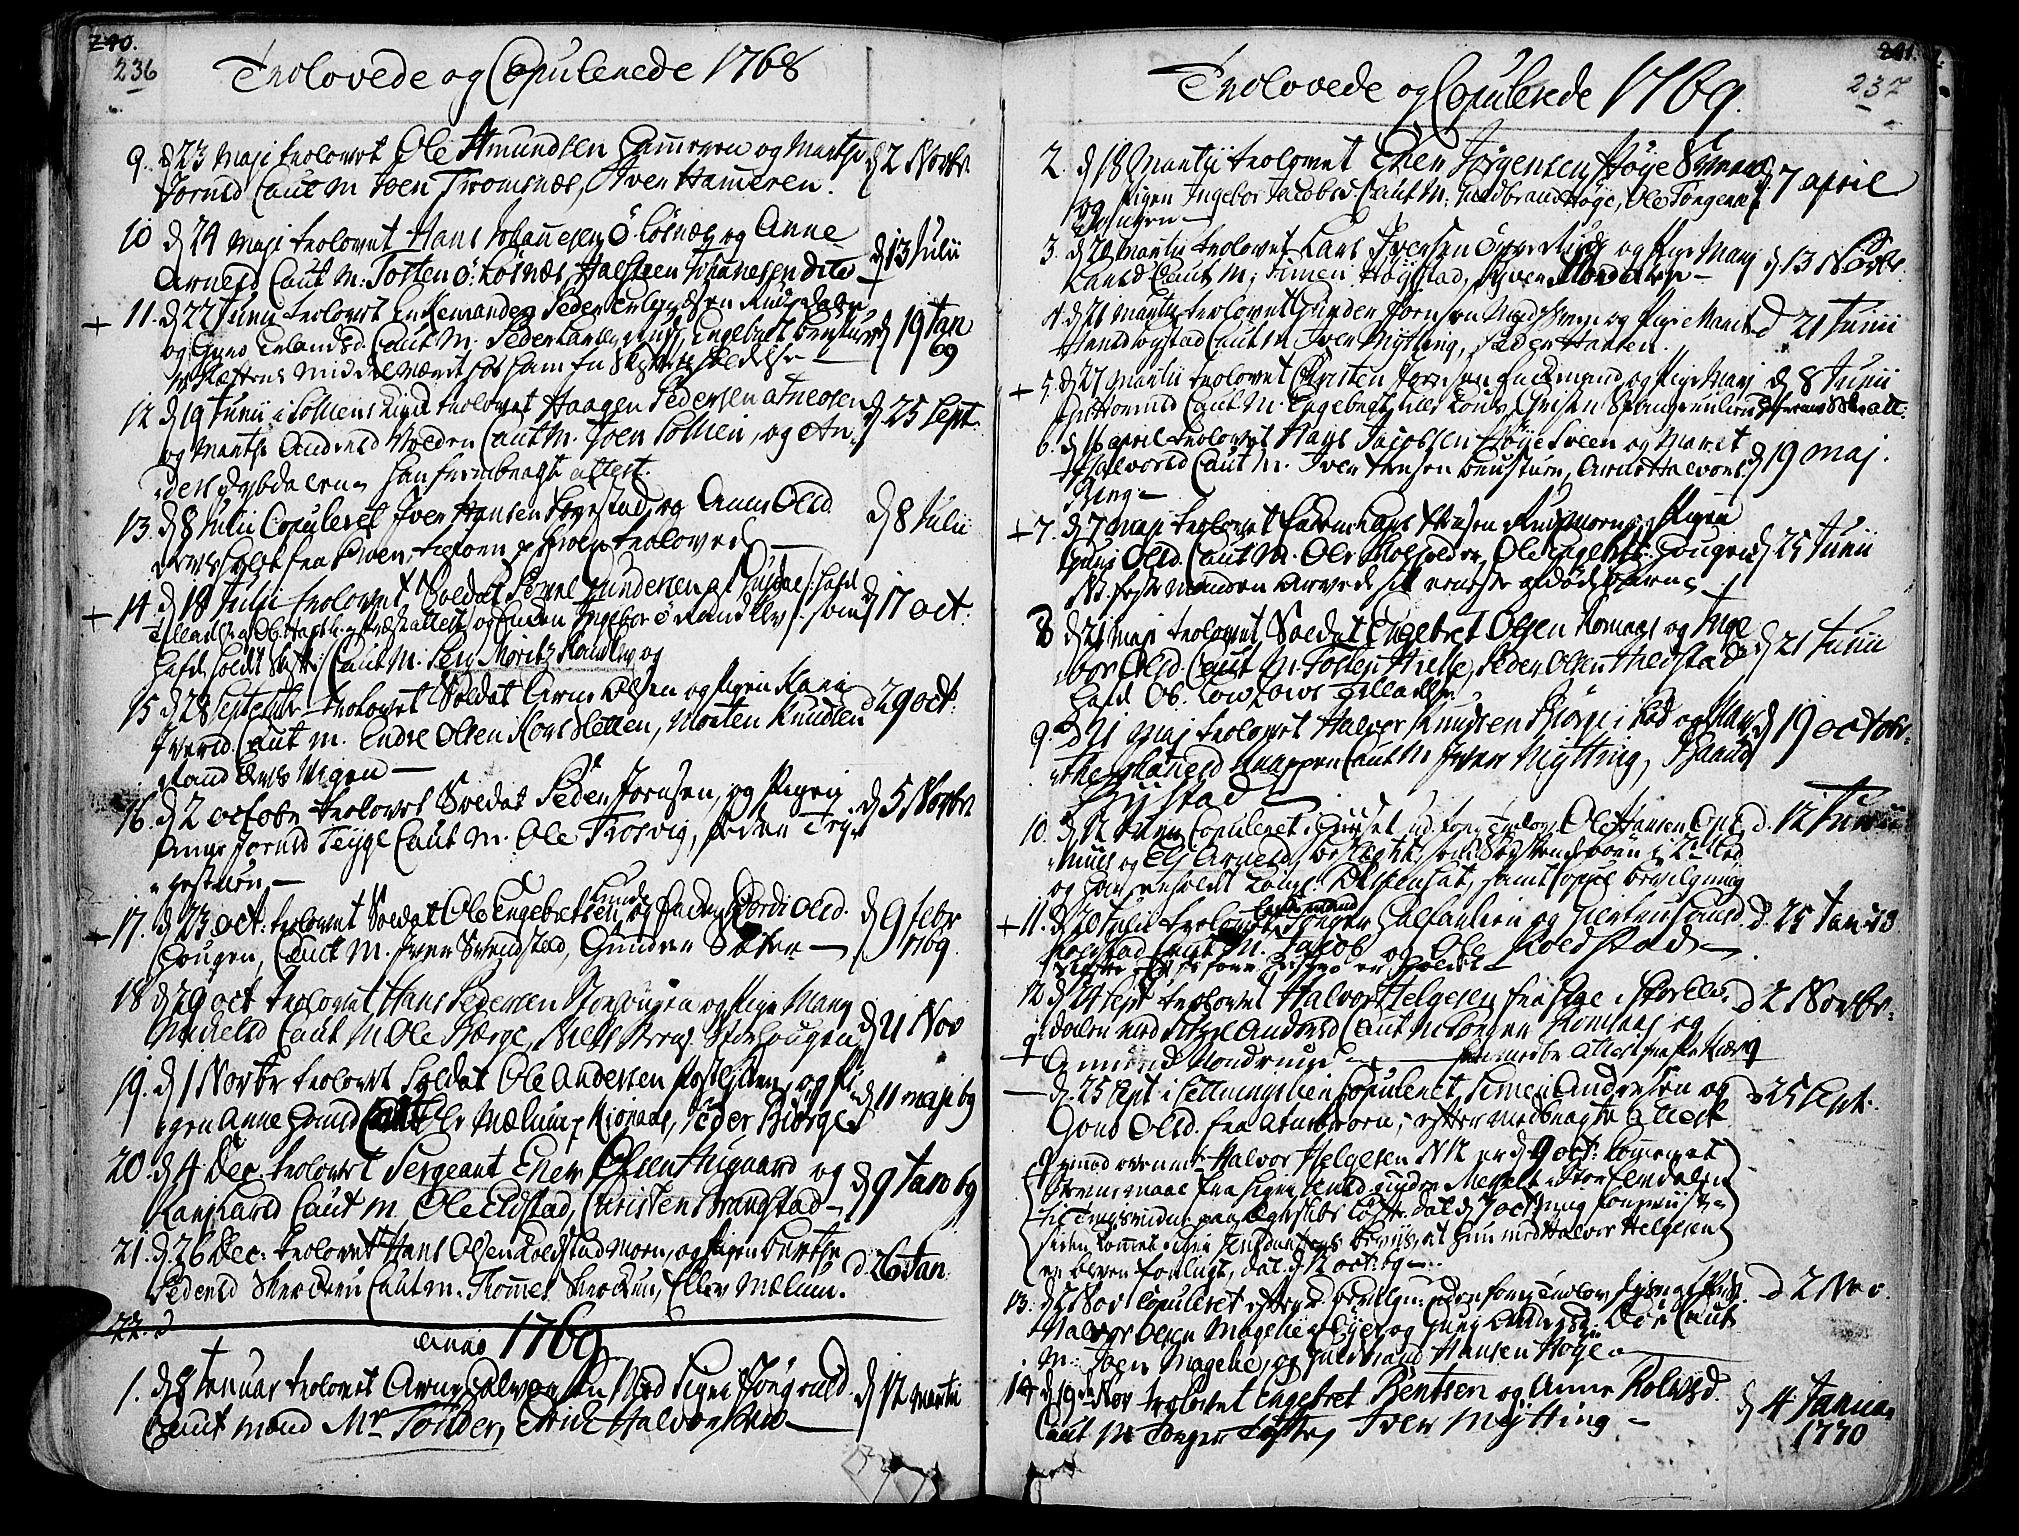 SAH, Ringebu prestekontor, Ministerialbok nr. 2, 1734-1780, s. 236-237